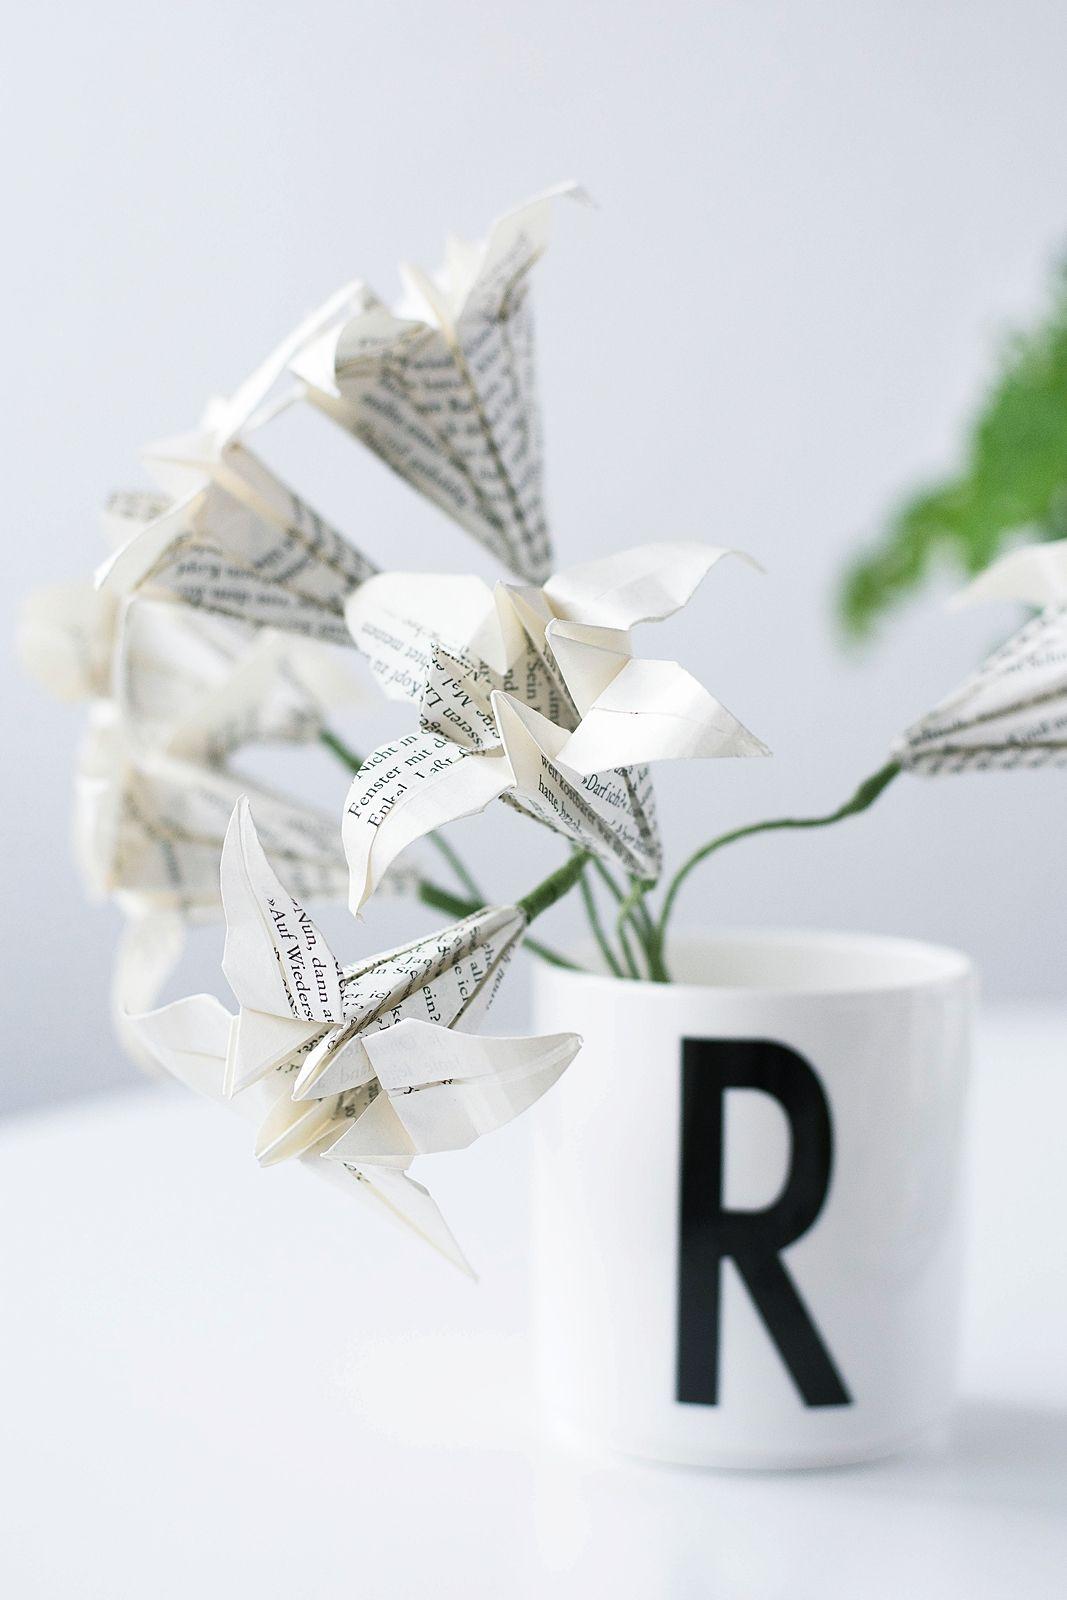 Nordic Farmhouse Style Diy Spring Decor Papierblumen